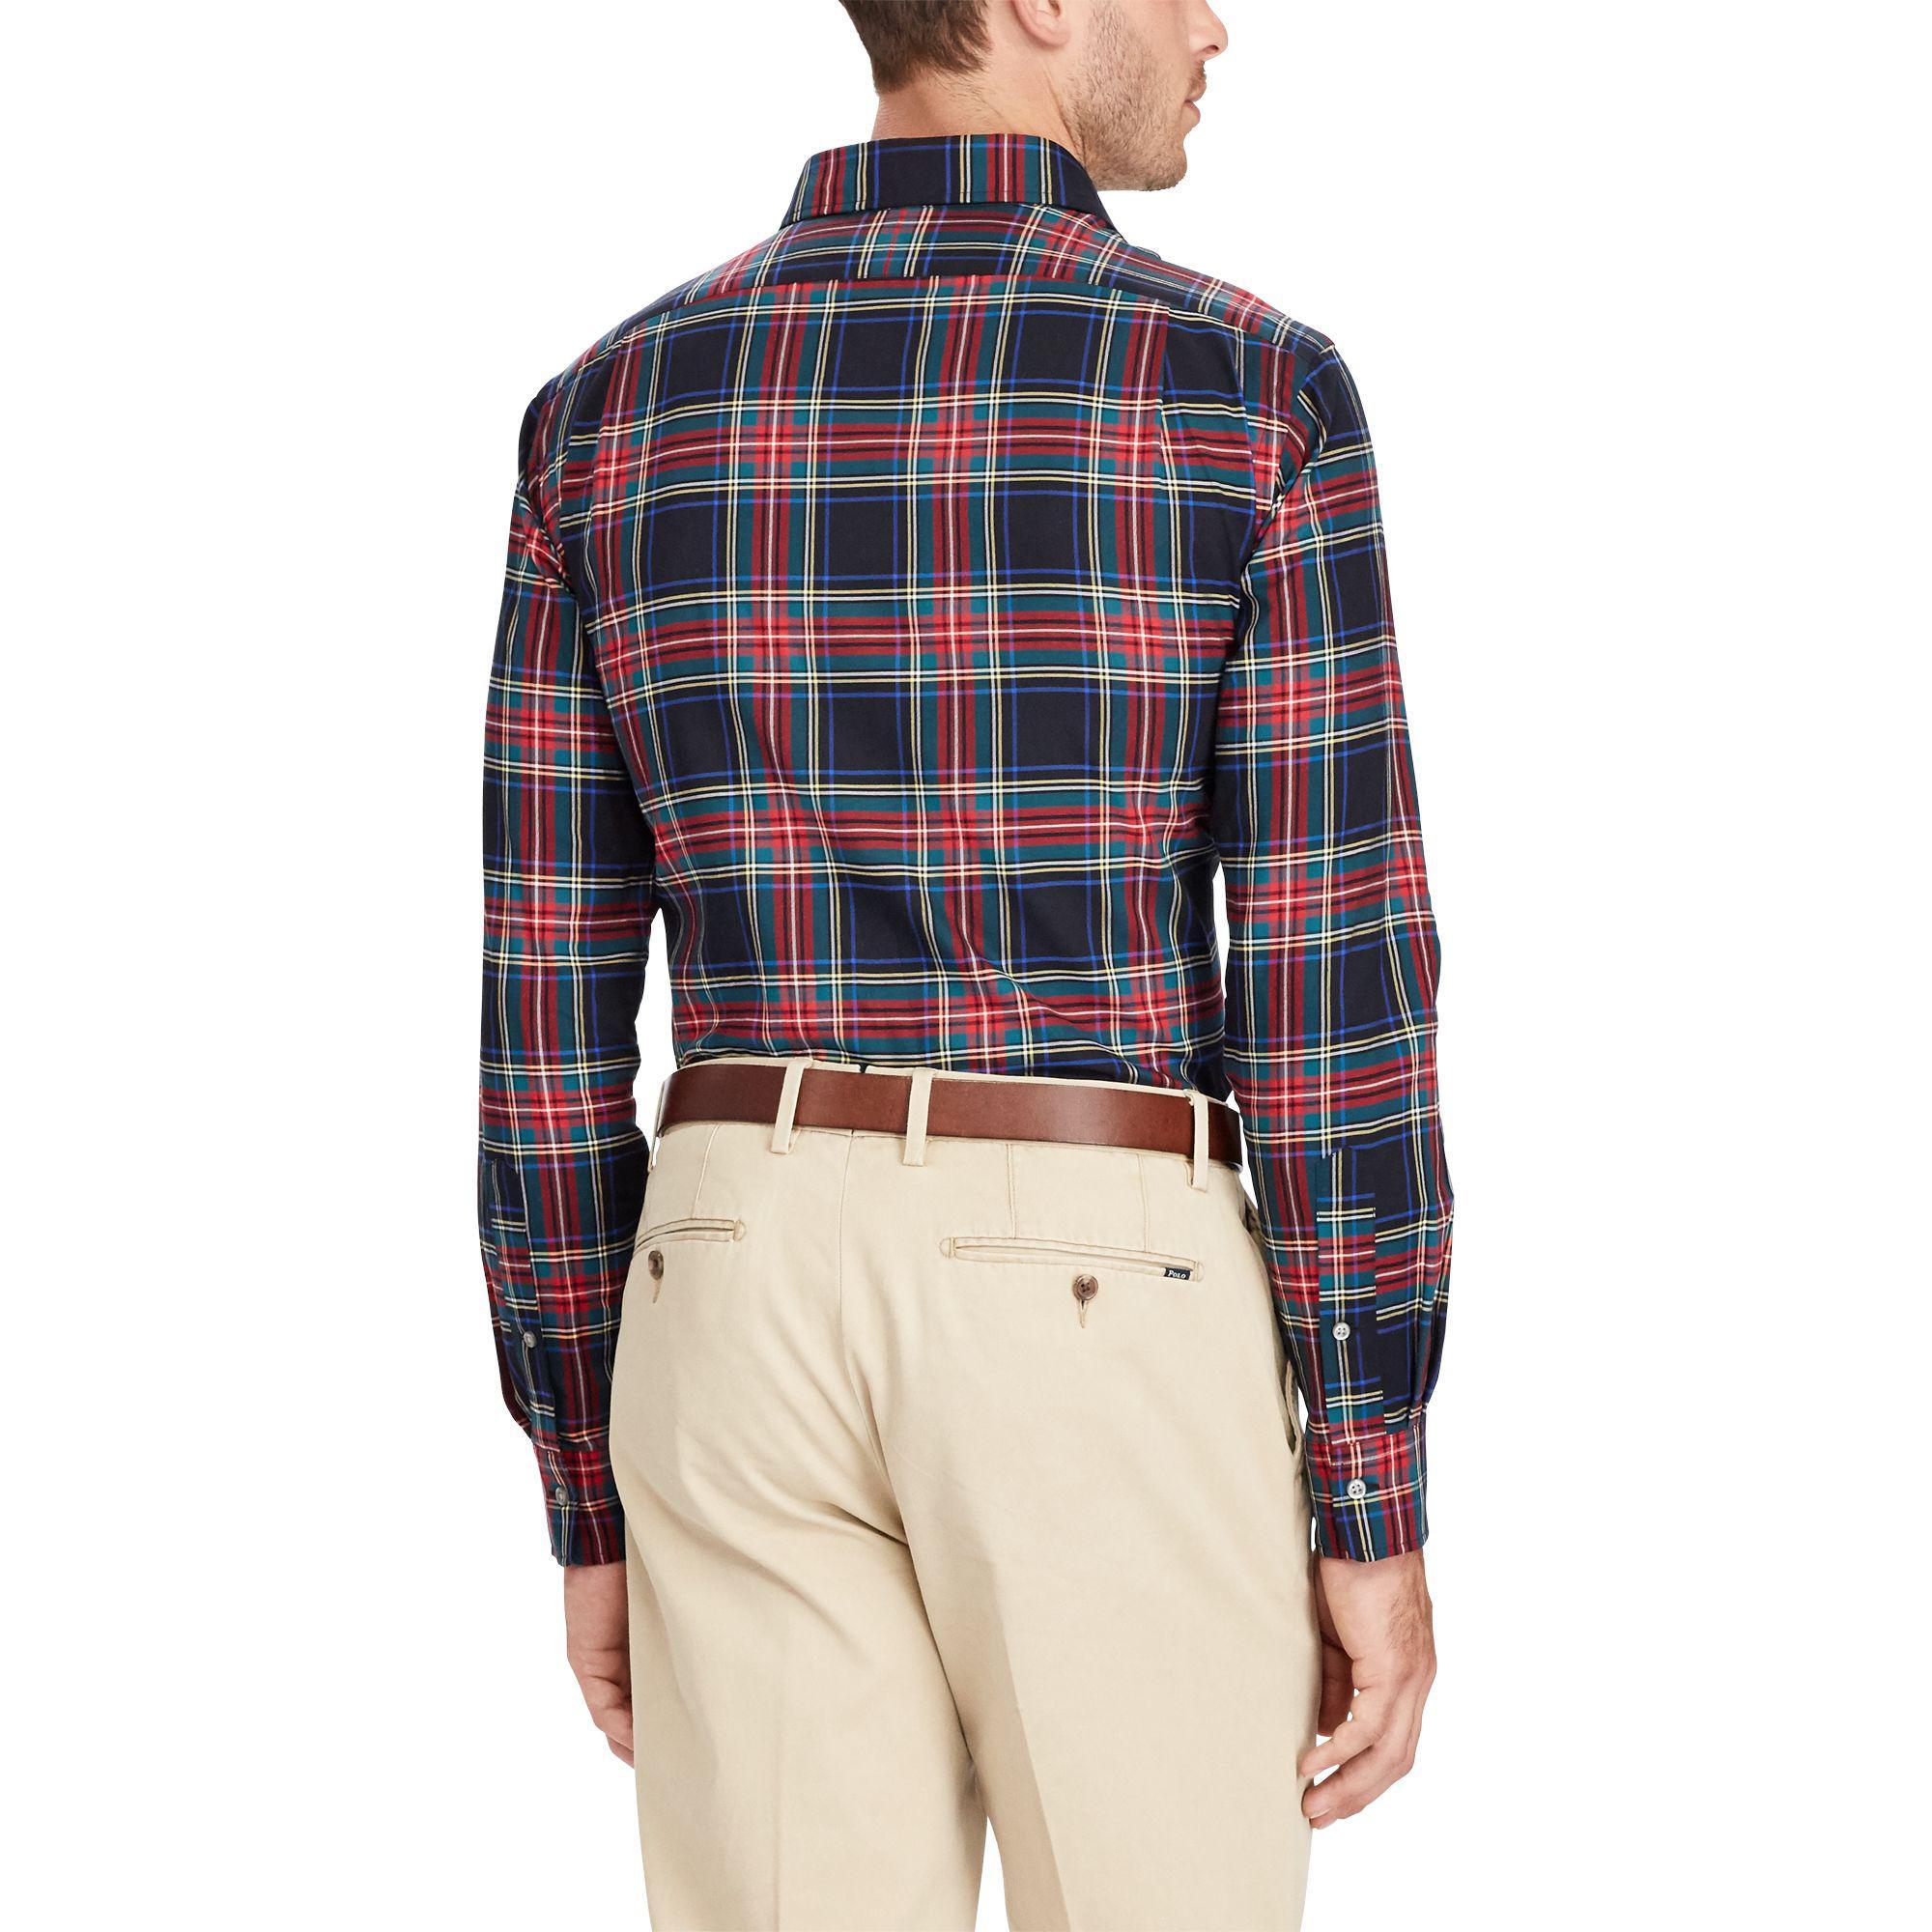 7a1981e8 ... inexpensive usa polo ralph lauren slim fit plaid cotton shirt for men  lyst da6d1 7c791 4ab46